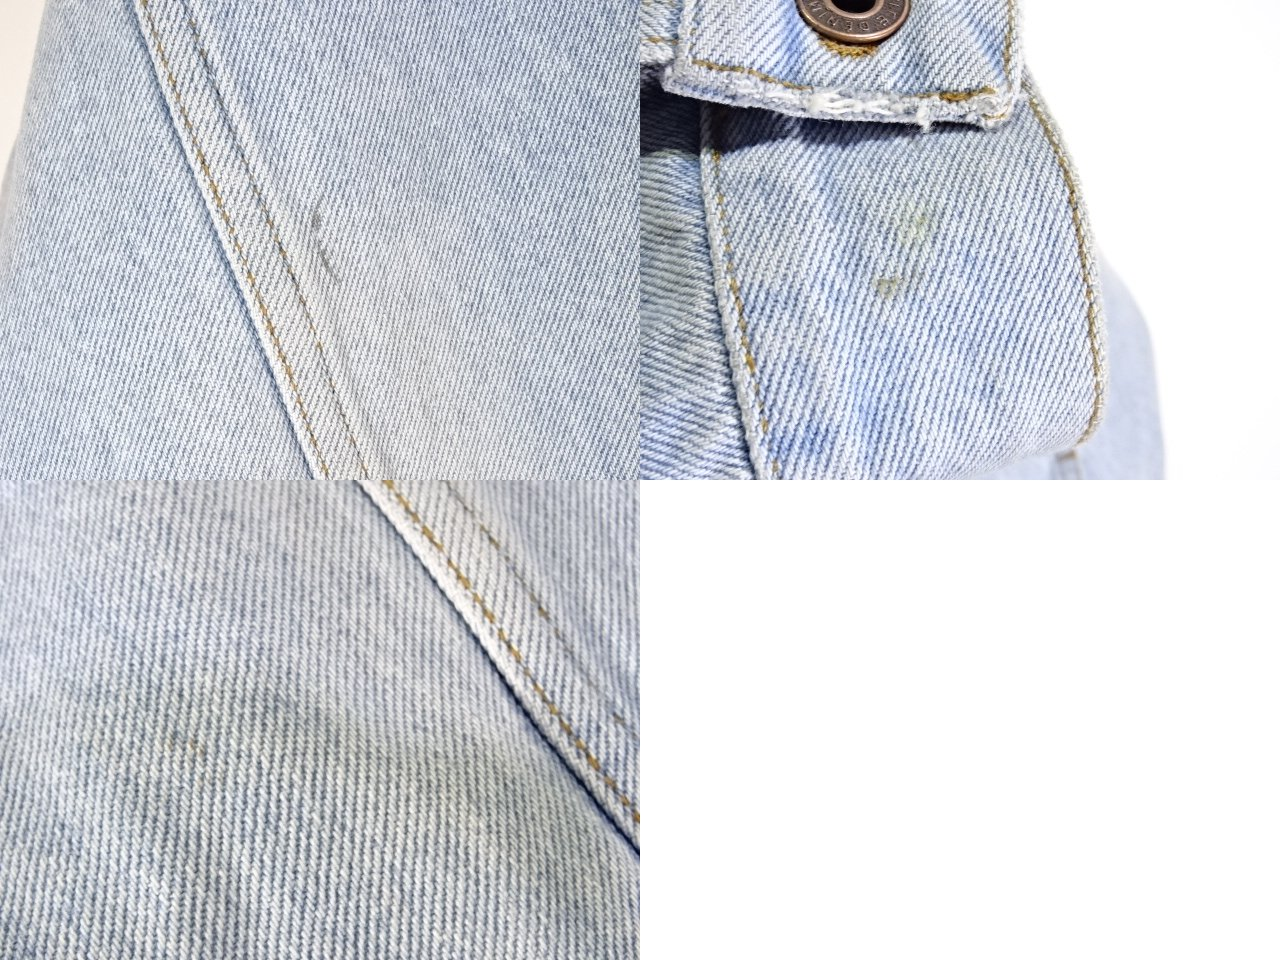 OFF-WHITE 17ss WOMAN DENIM OVER JACKET サイズXS オフホワイト デニムジャケット トラッカー 大名店【中古】